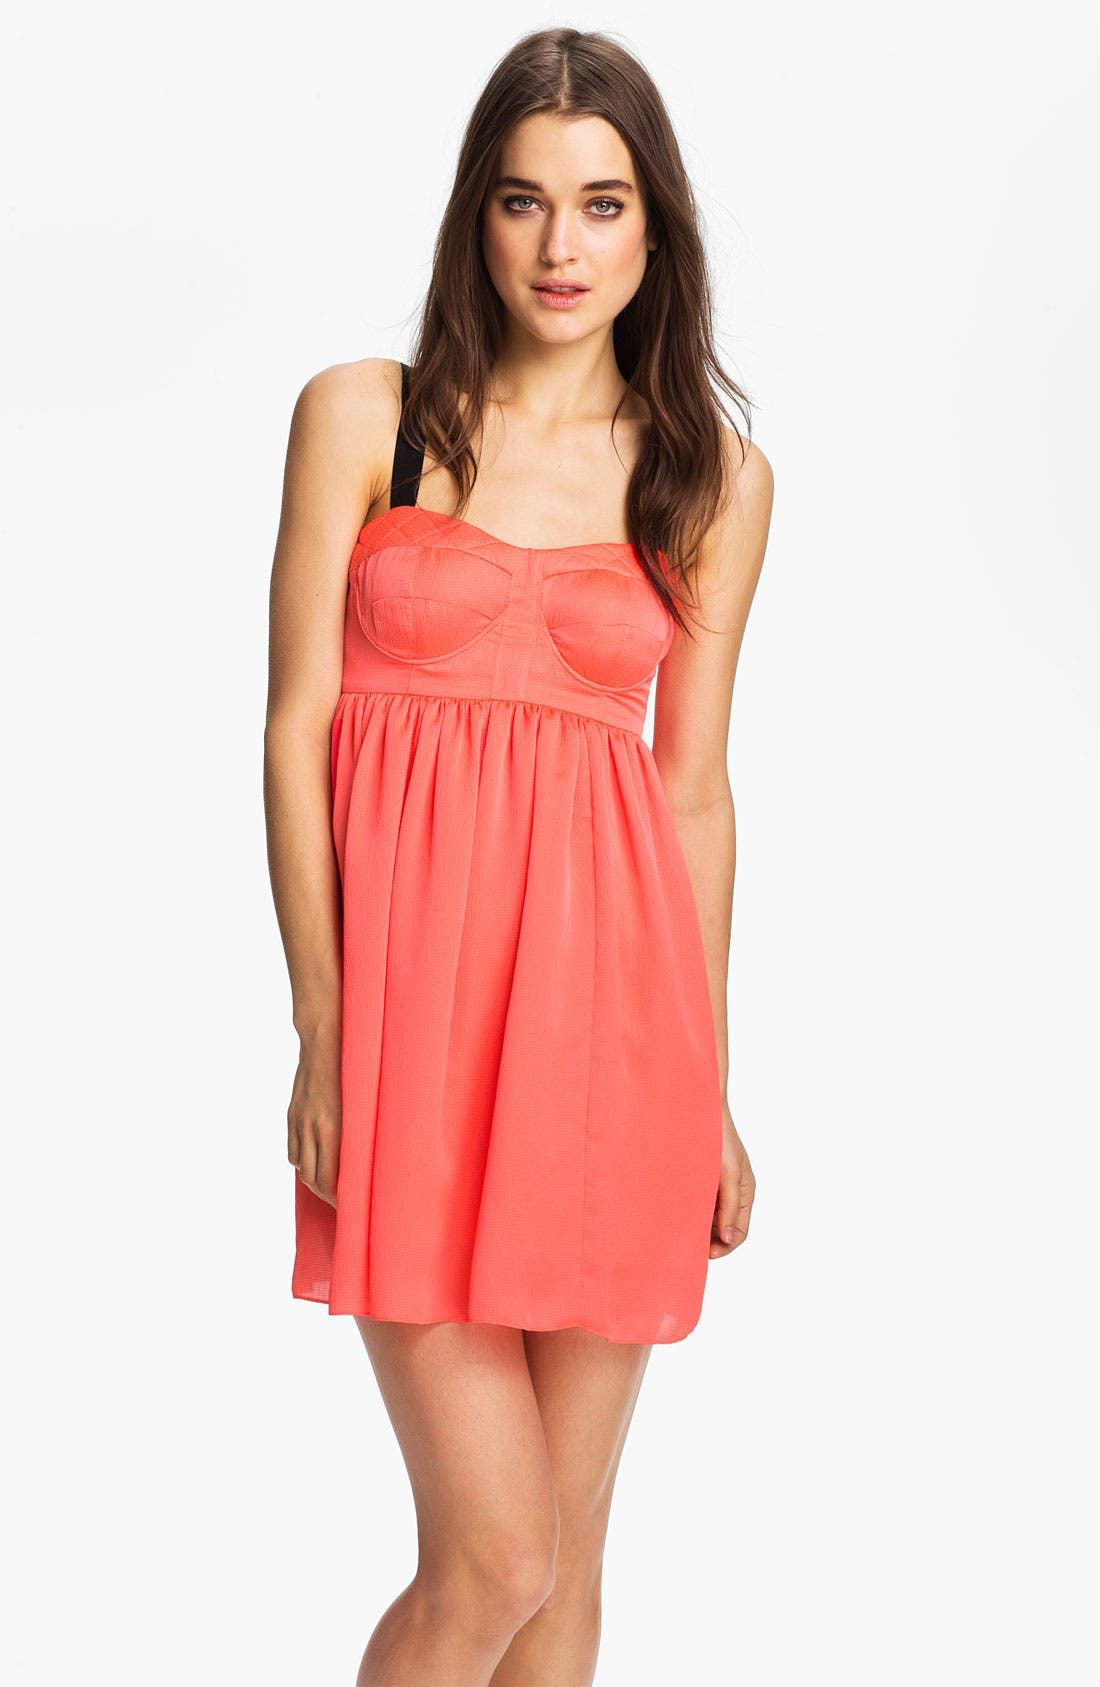 Alternate Image 1 Selected - Rebecca Minkoff 'Jami' Bustier Babydoll Dress